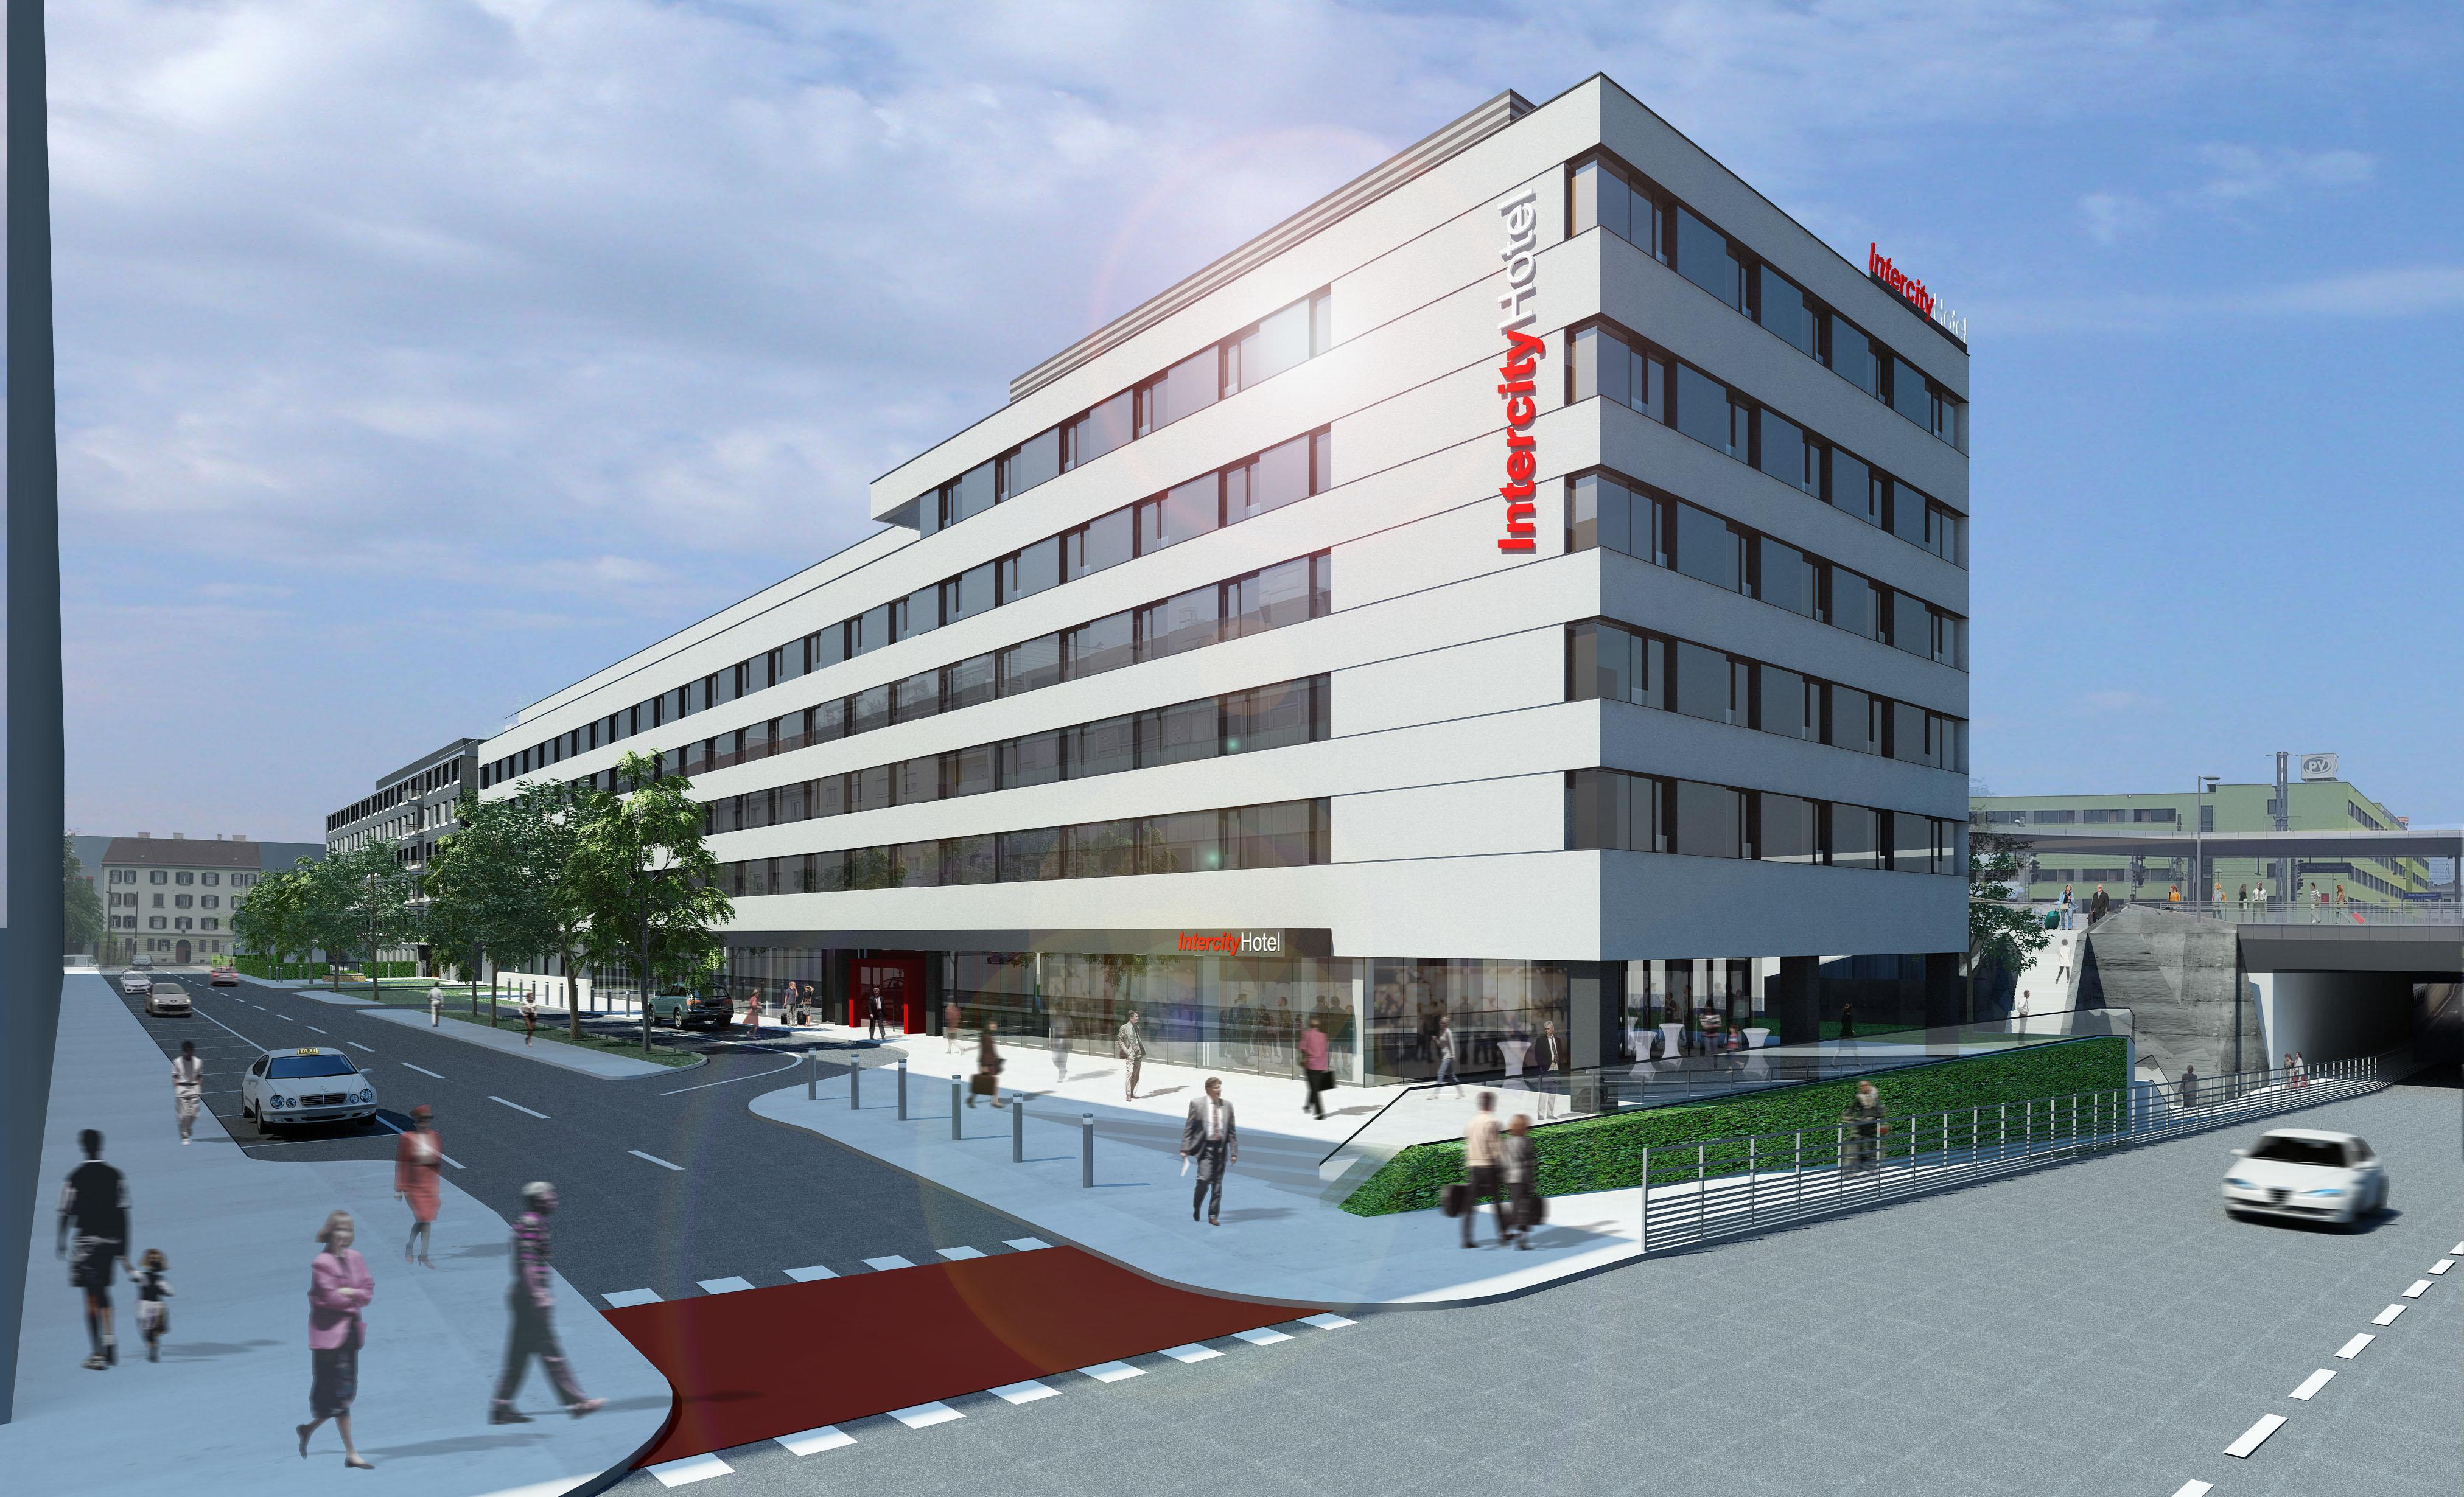 Intercity Hotel Finkengasse Graz